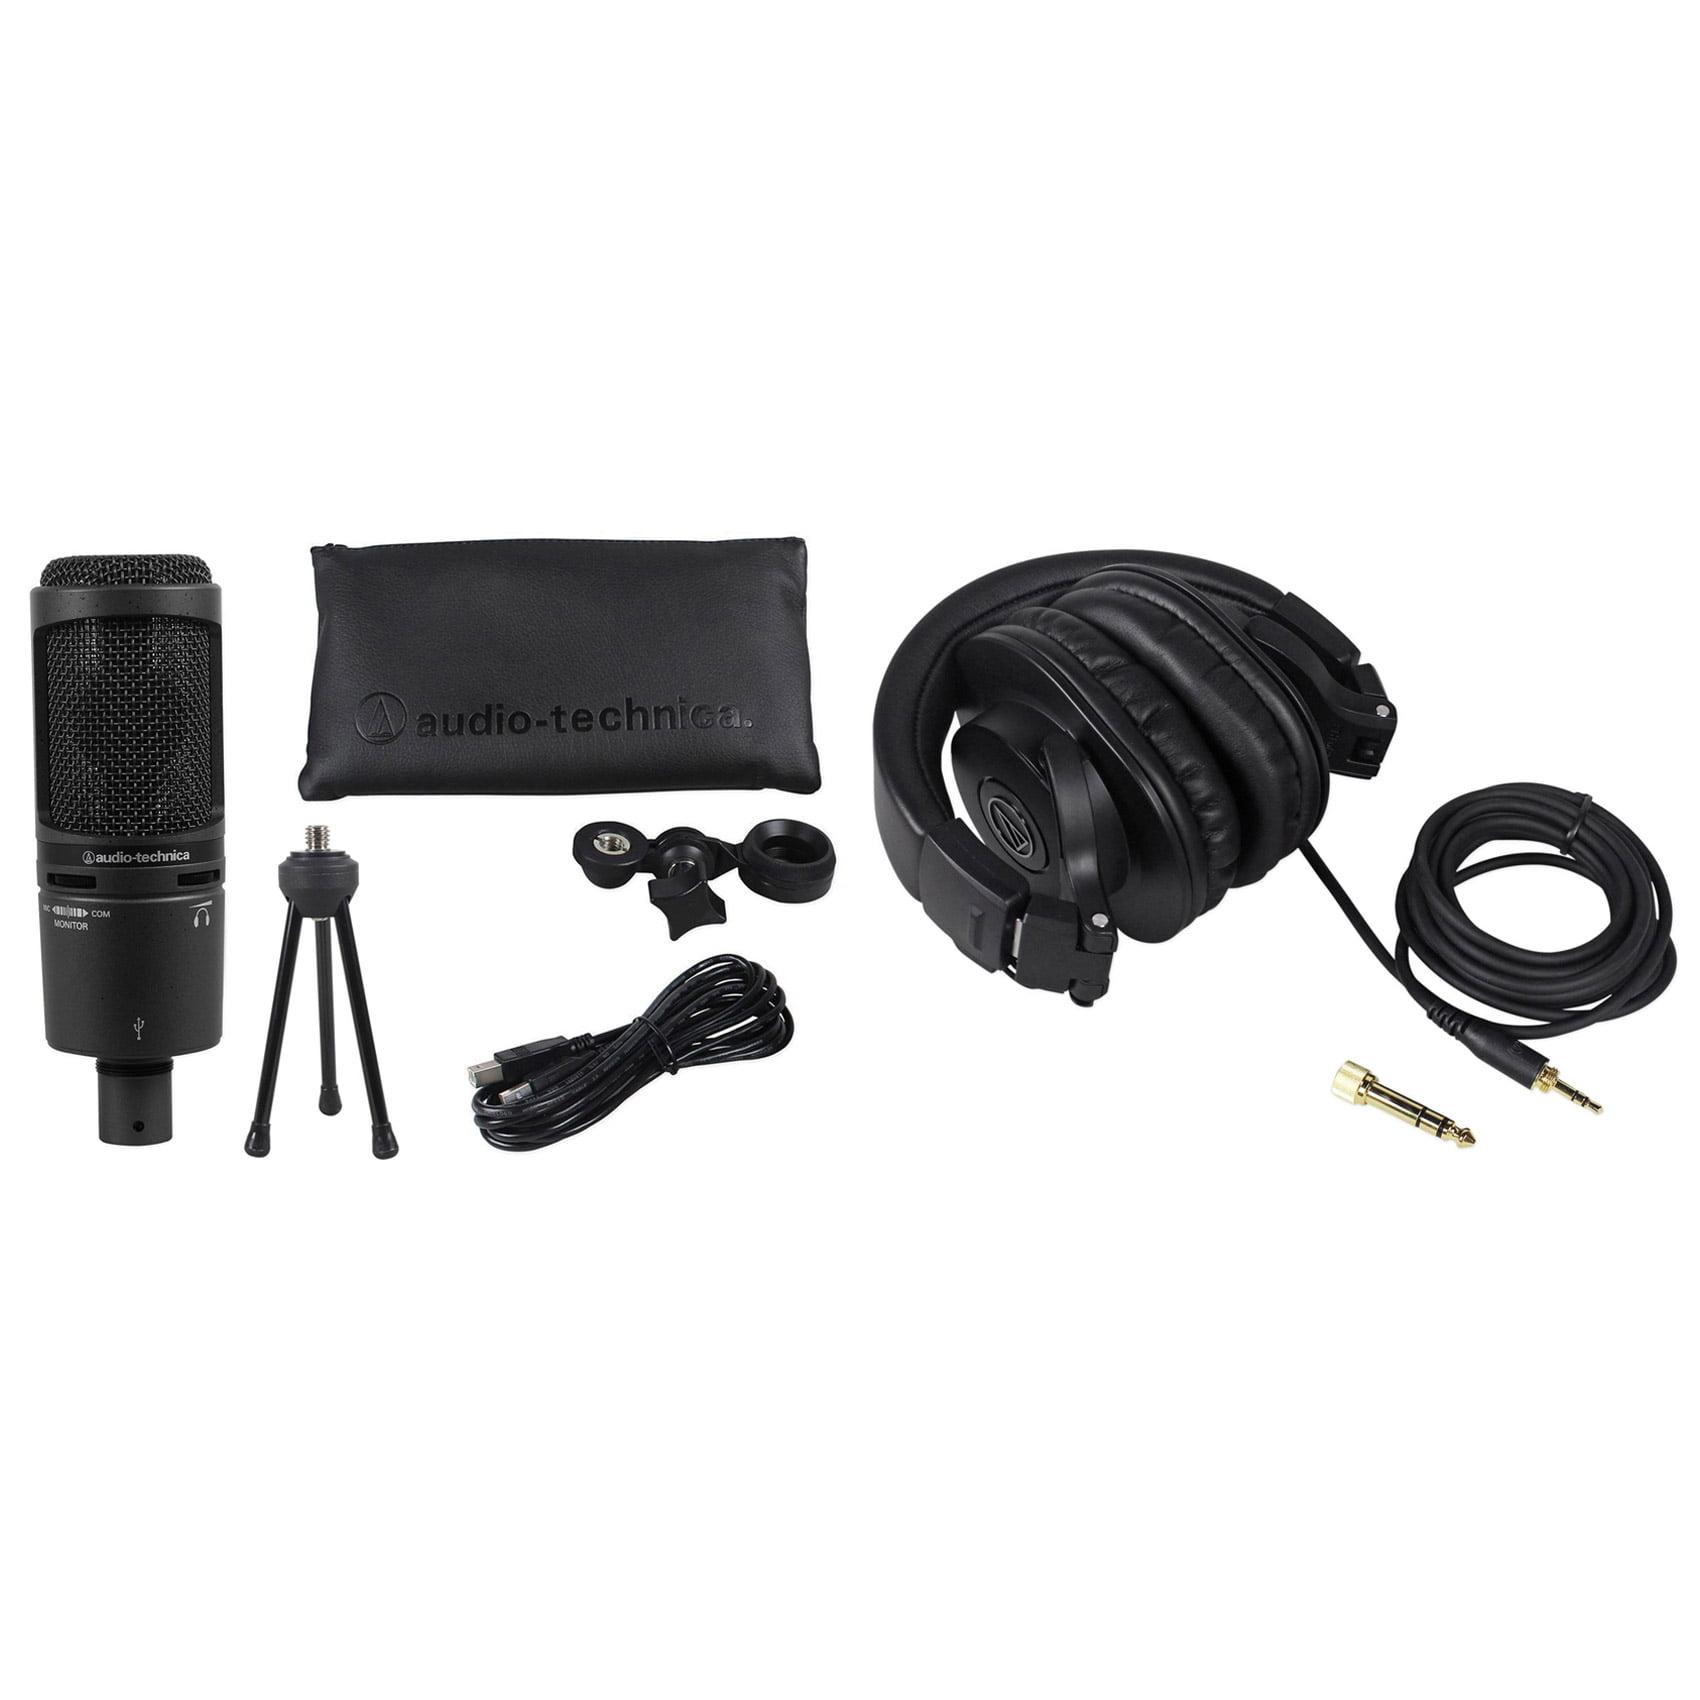 Audio-Technica AT2020USB+PLUS USB Recording Mic+Stand+Cas...